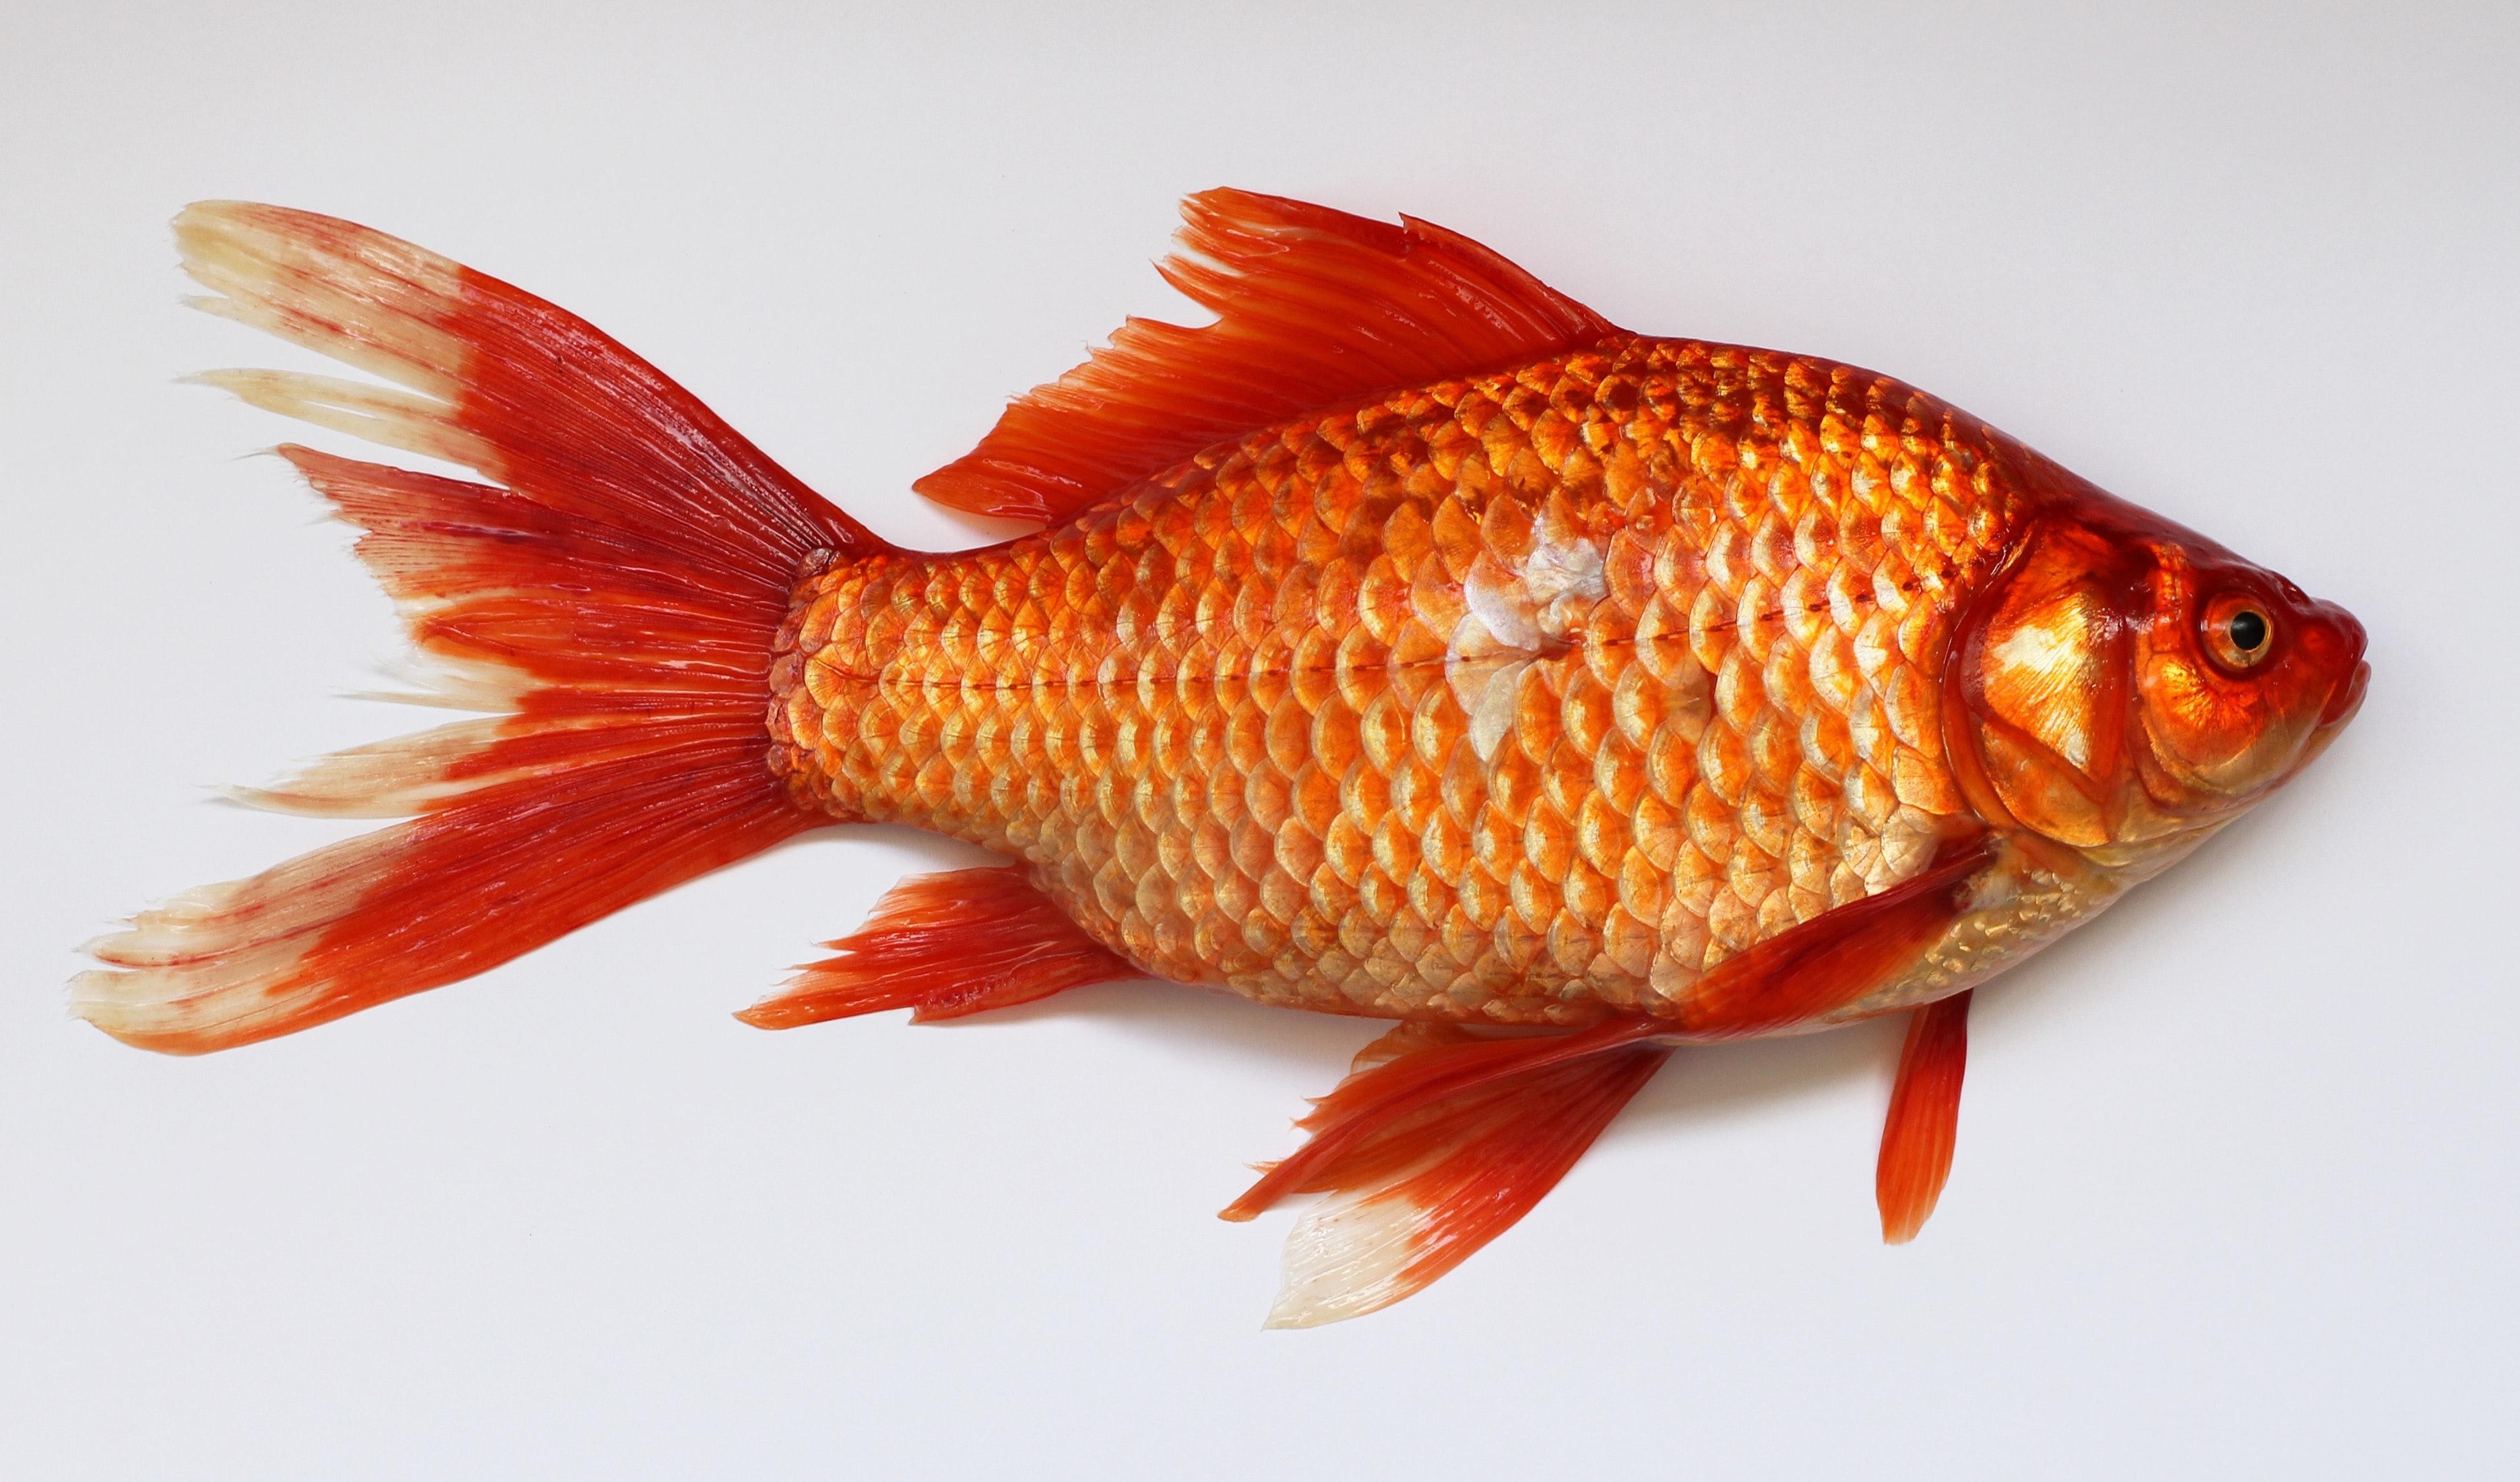 Red Fish · Free Stock Photo